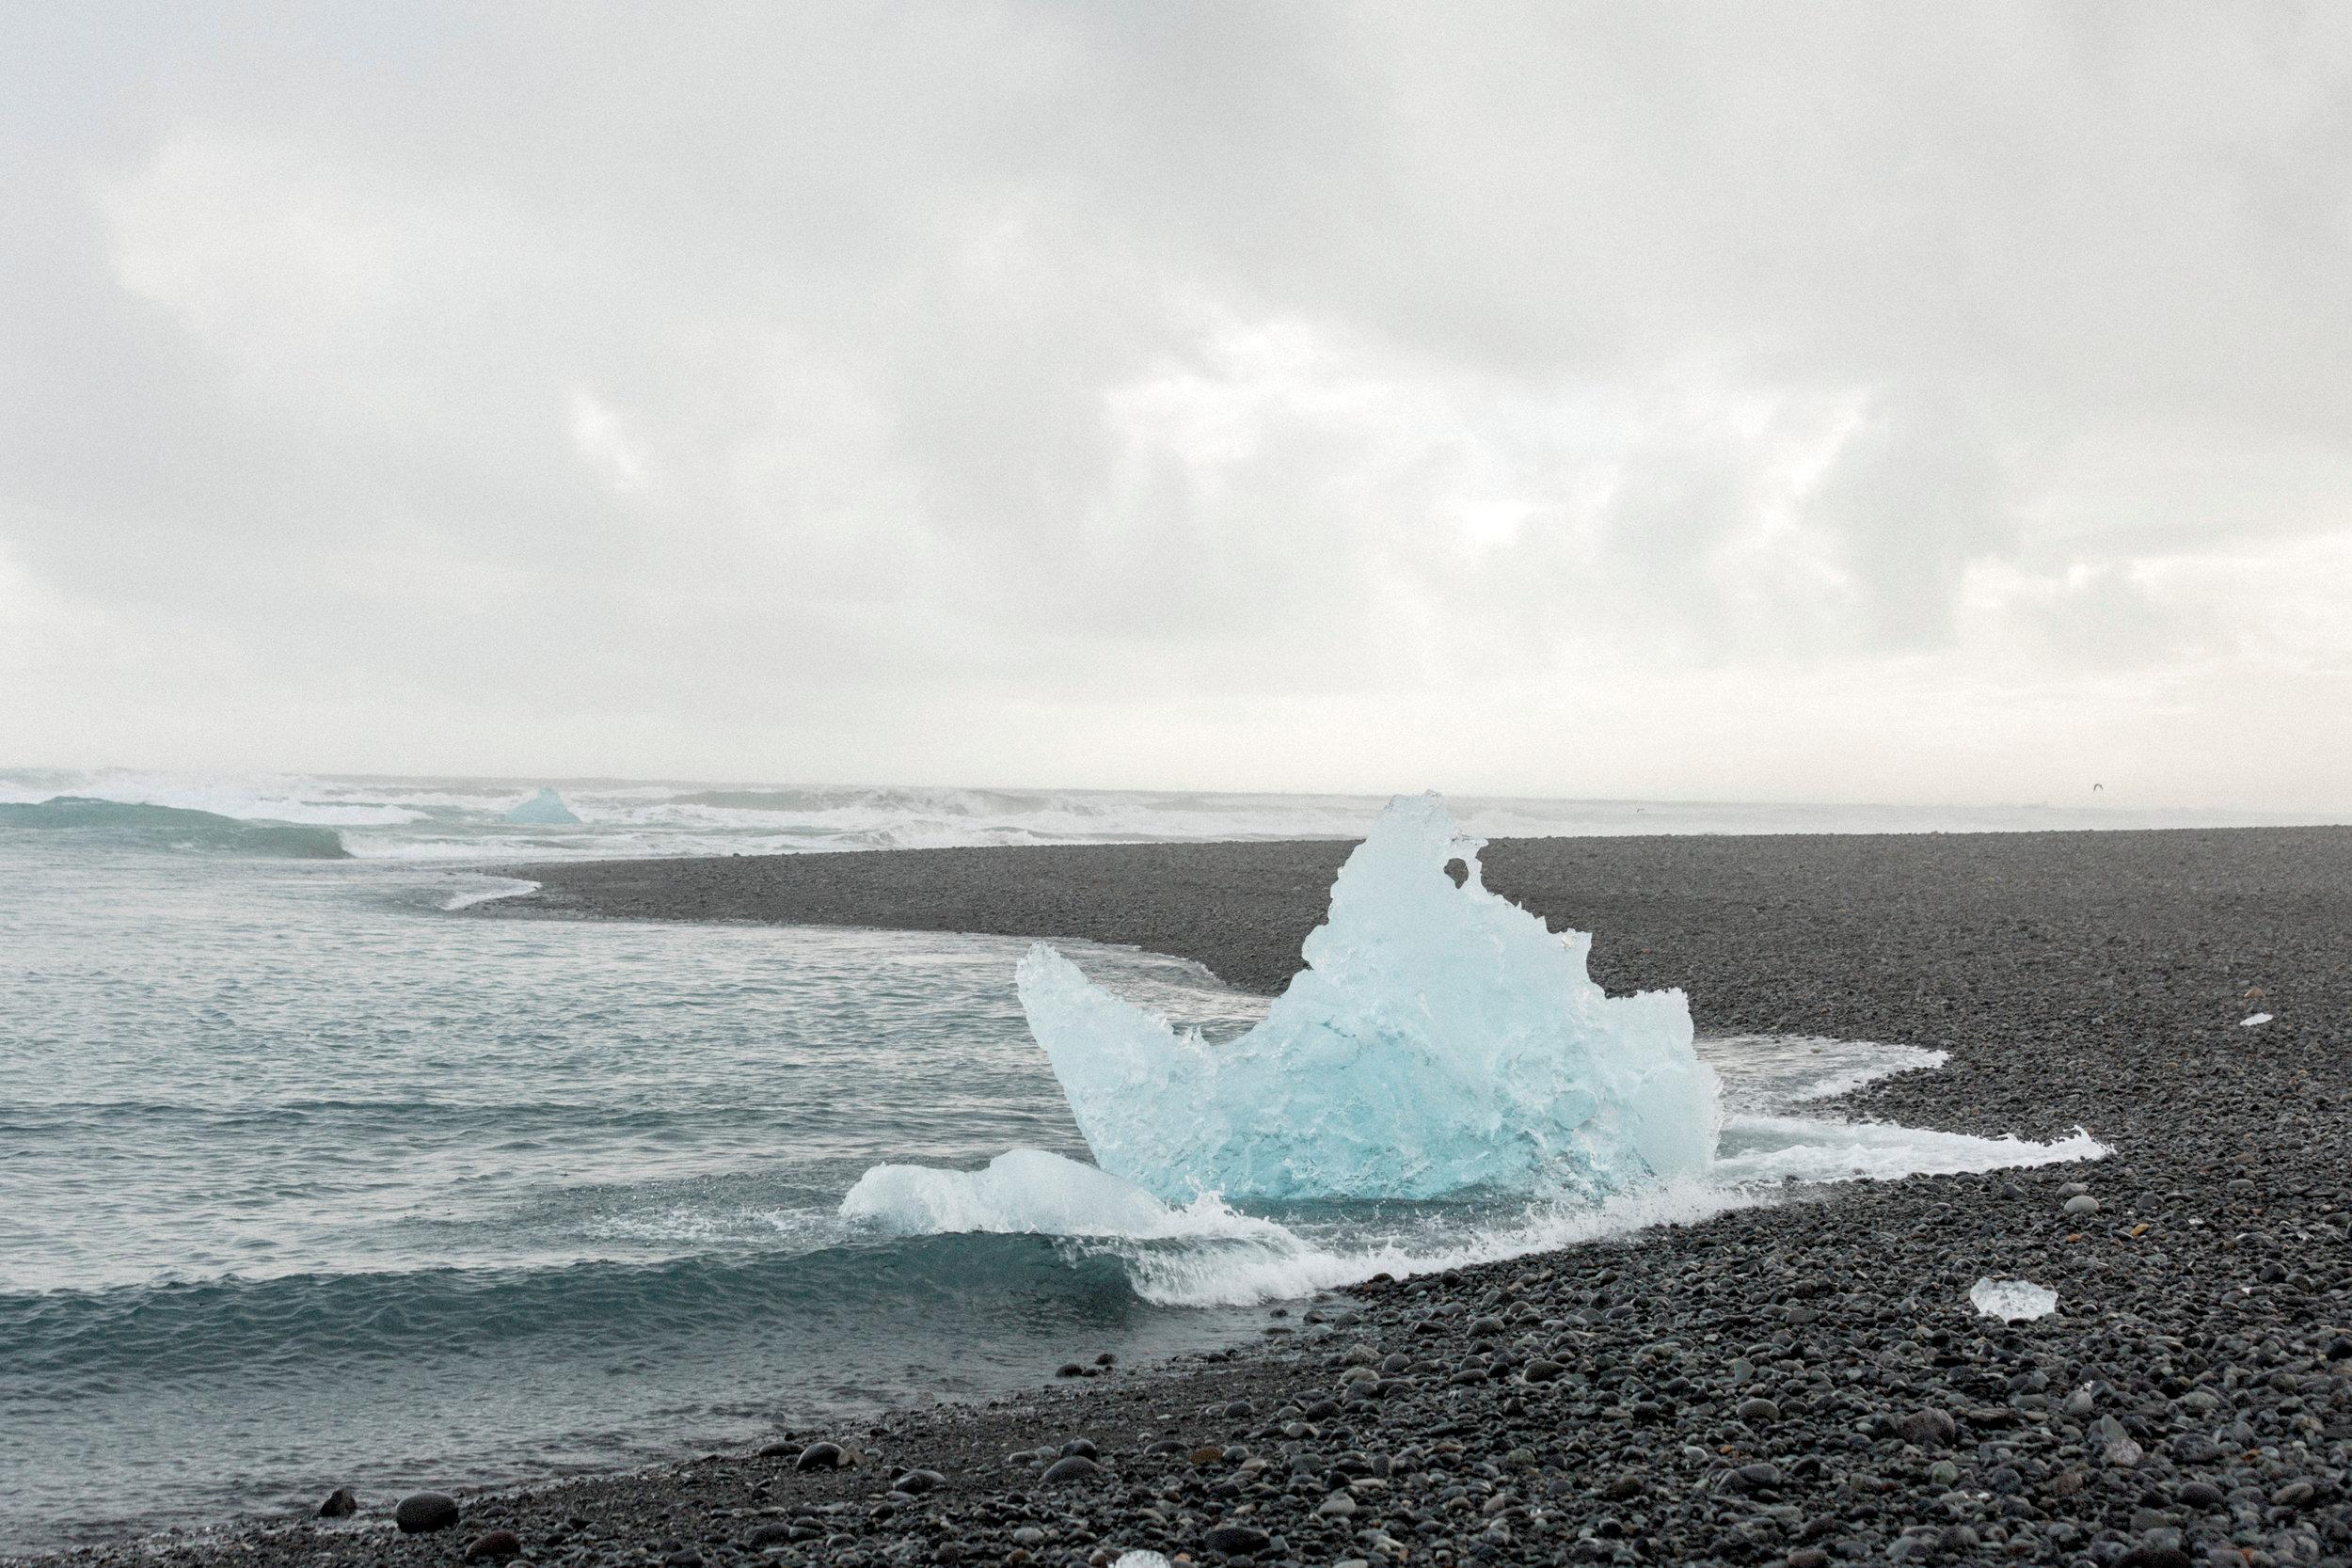 20160930_ICELAND_1515.JPG